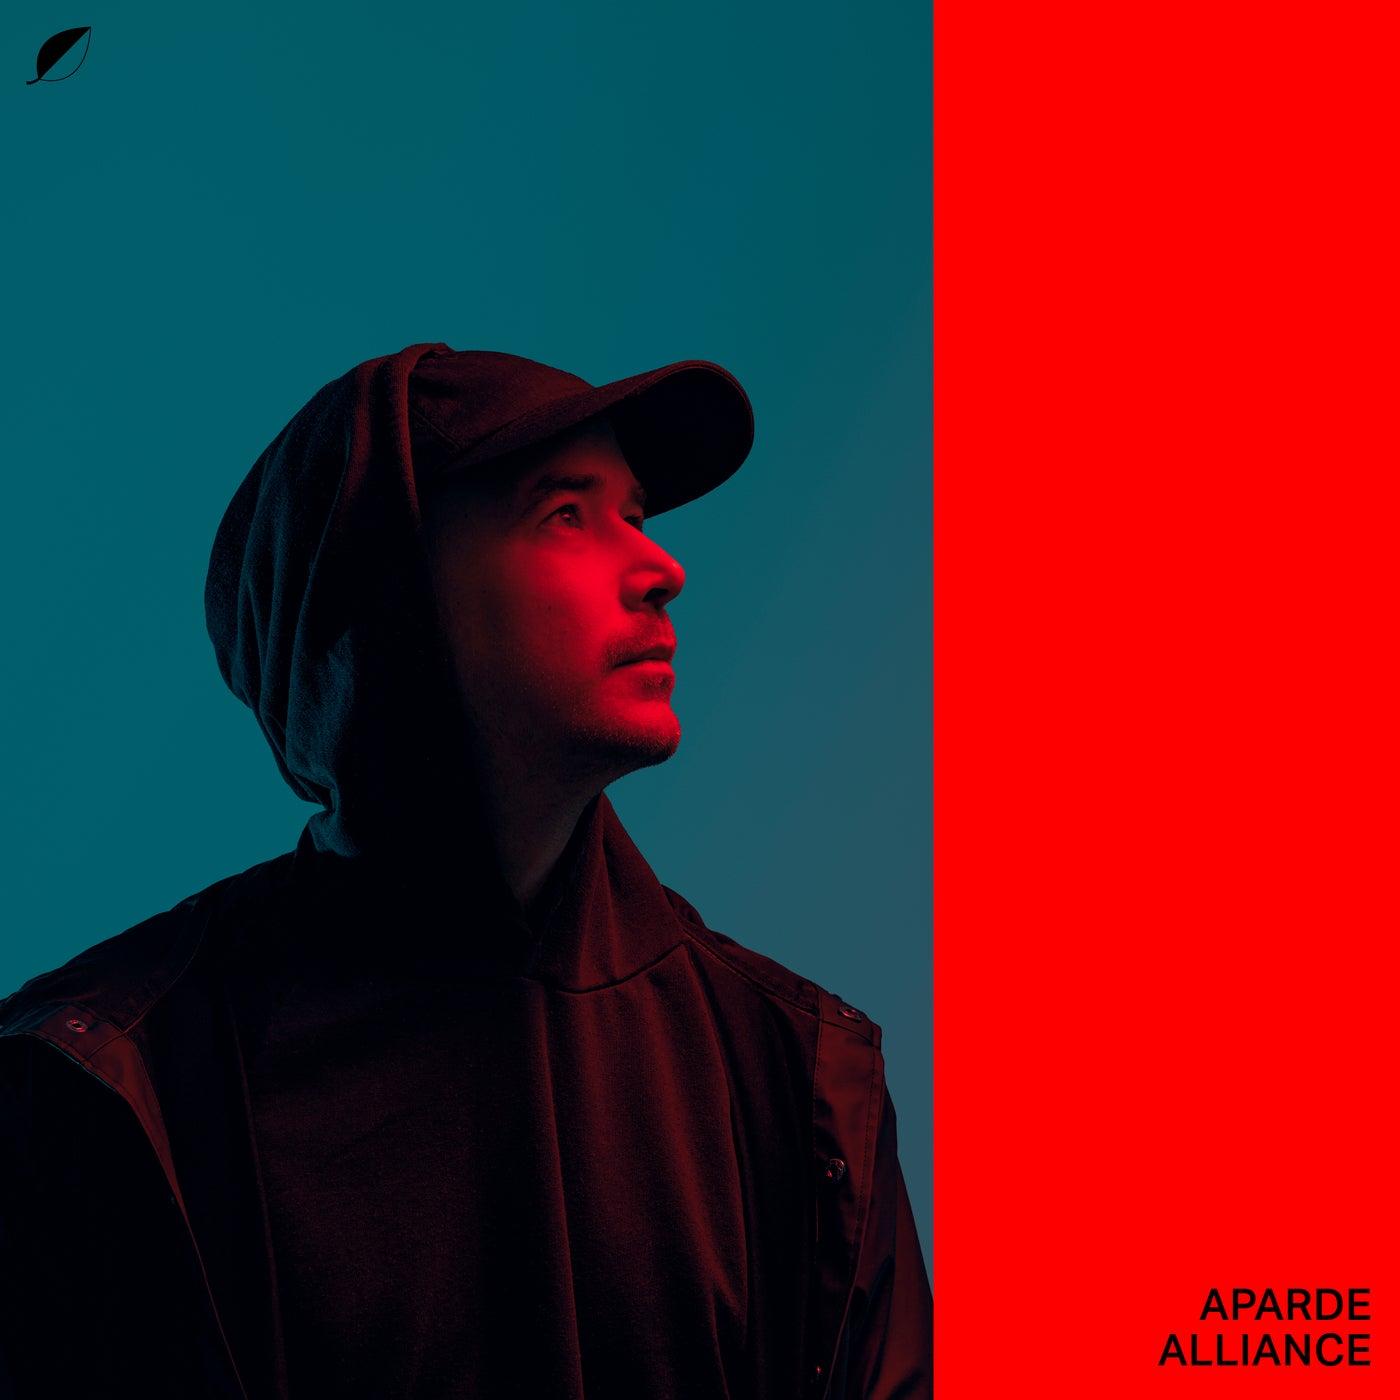 Aparde Alliance Cover